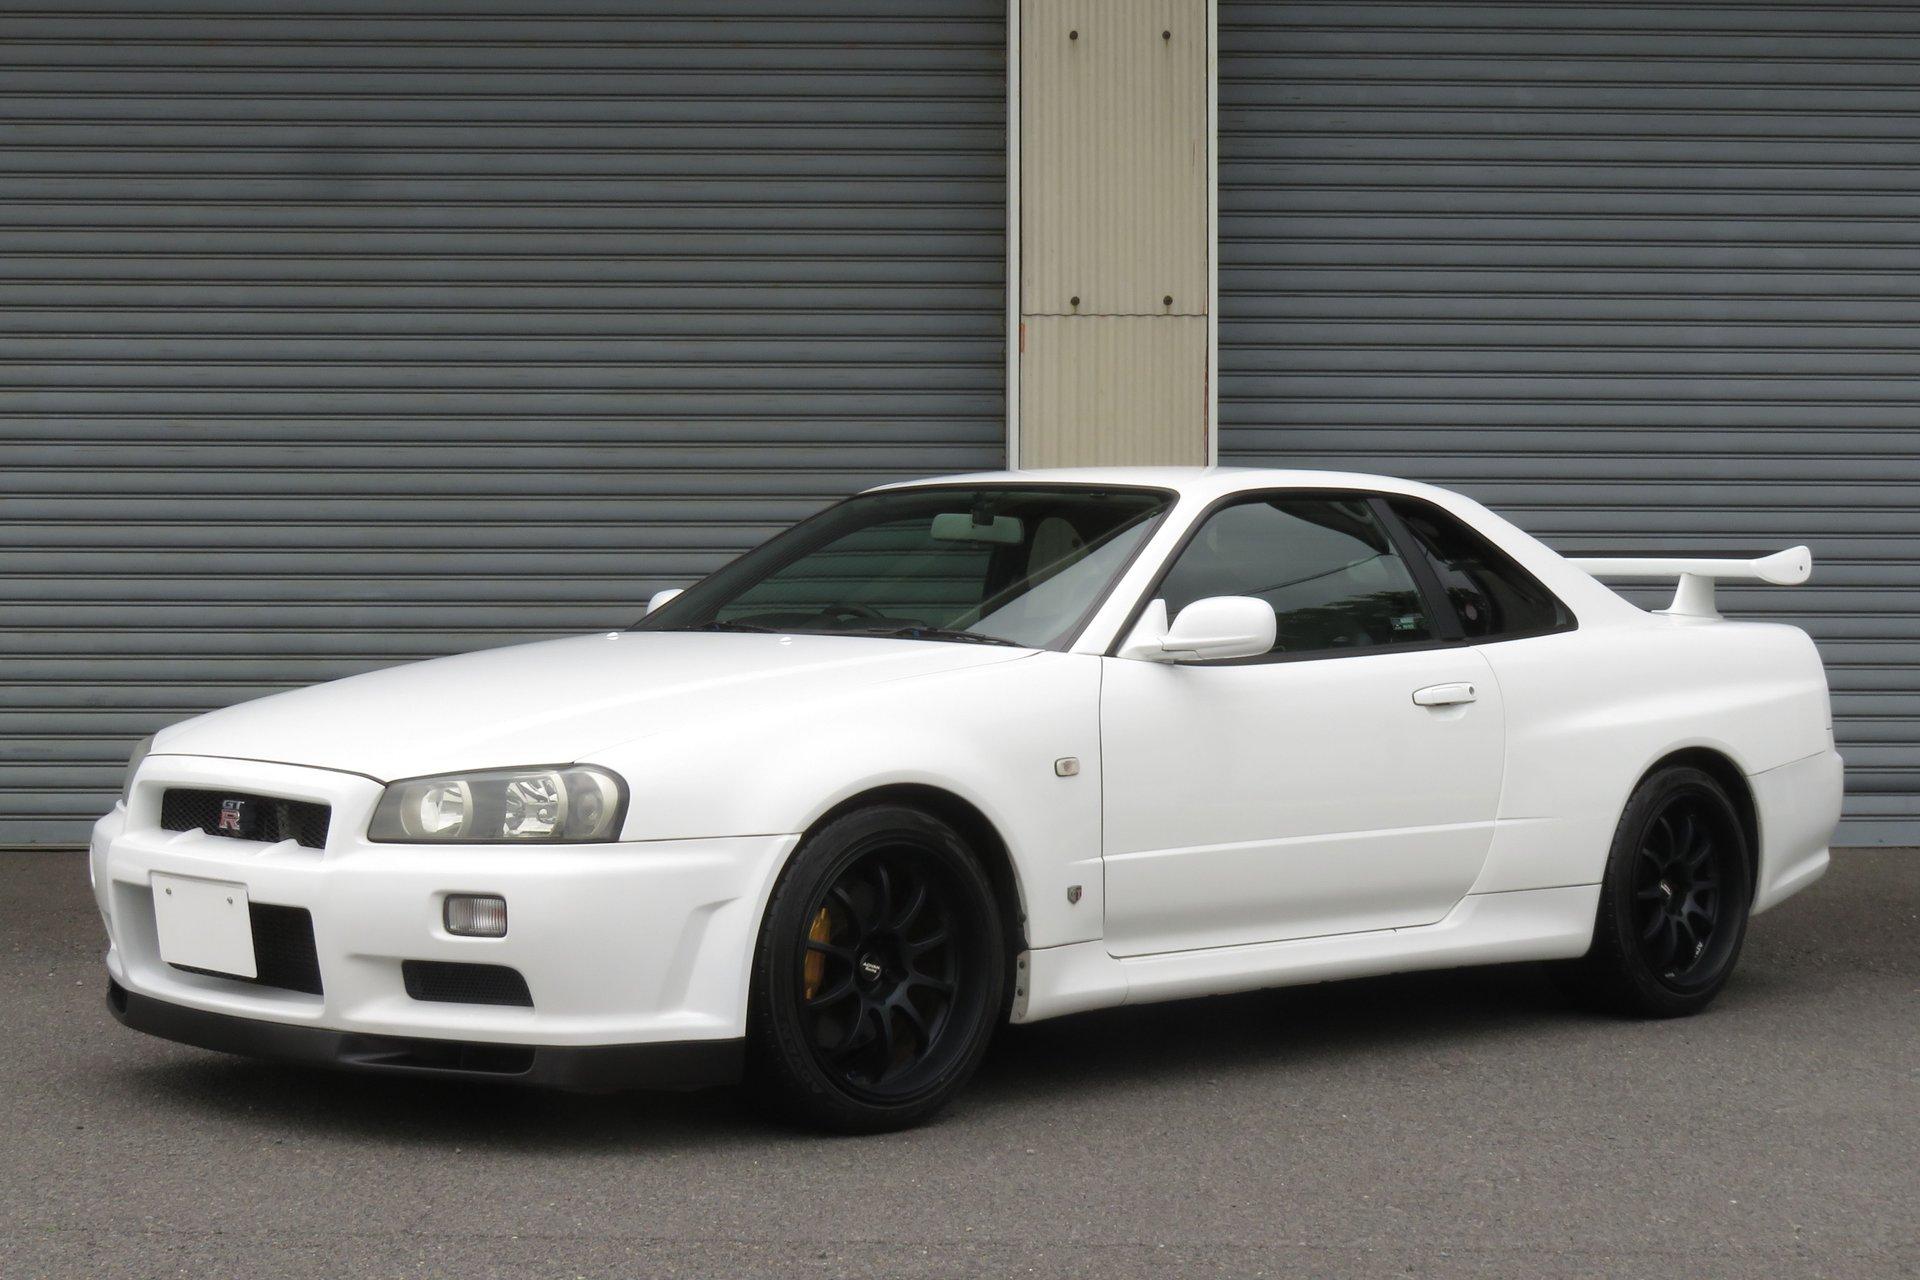 2000 Nissan Skyline GT-R